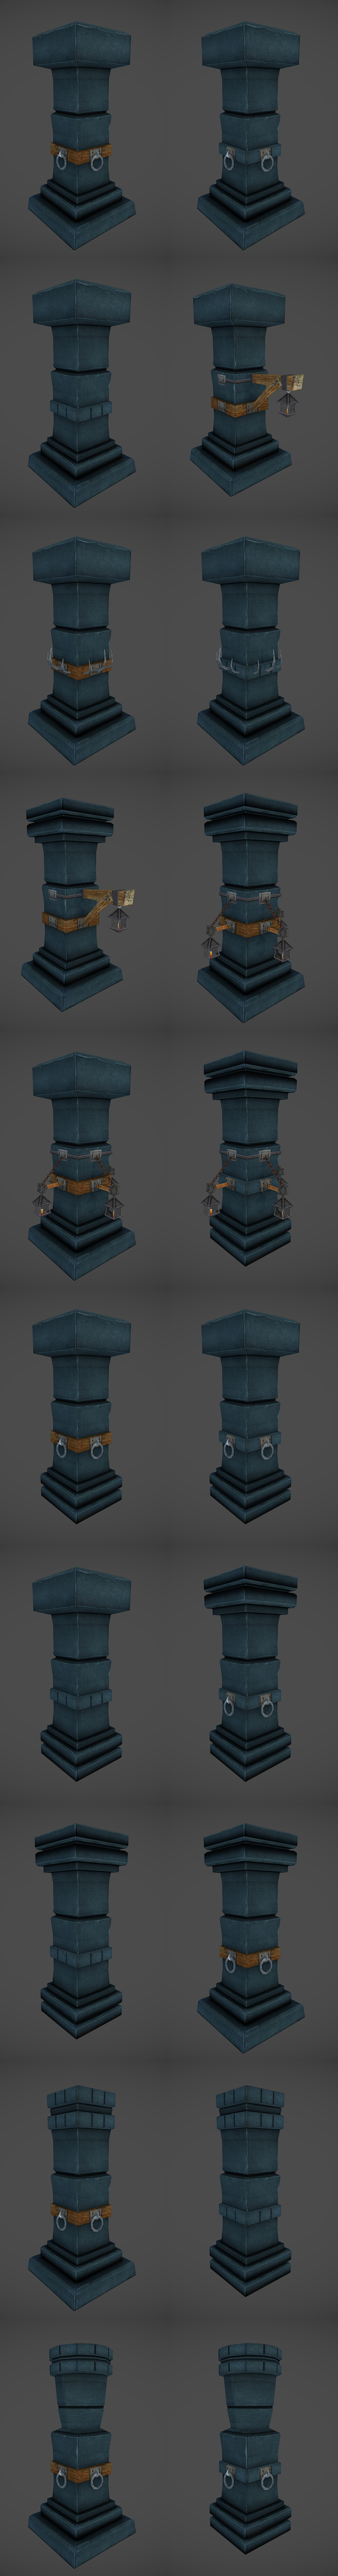 3DOcean Low Poly Dungeon Pillars 4356595